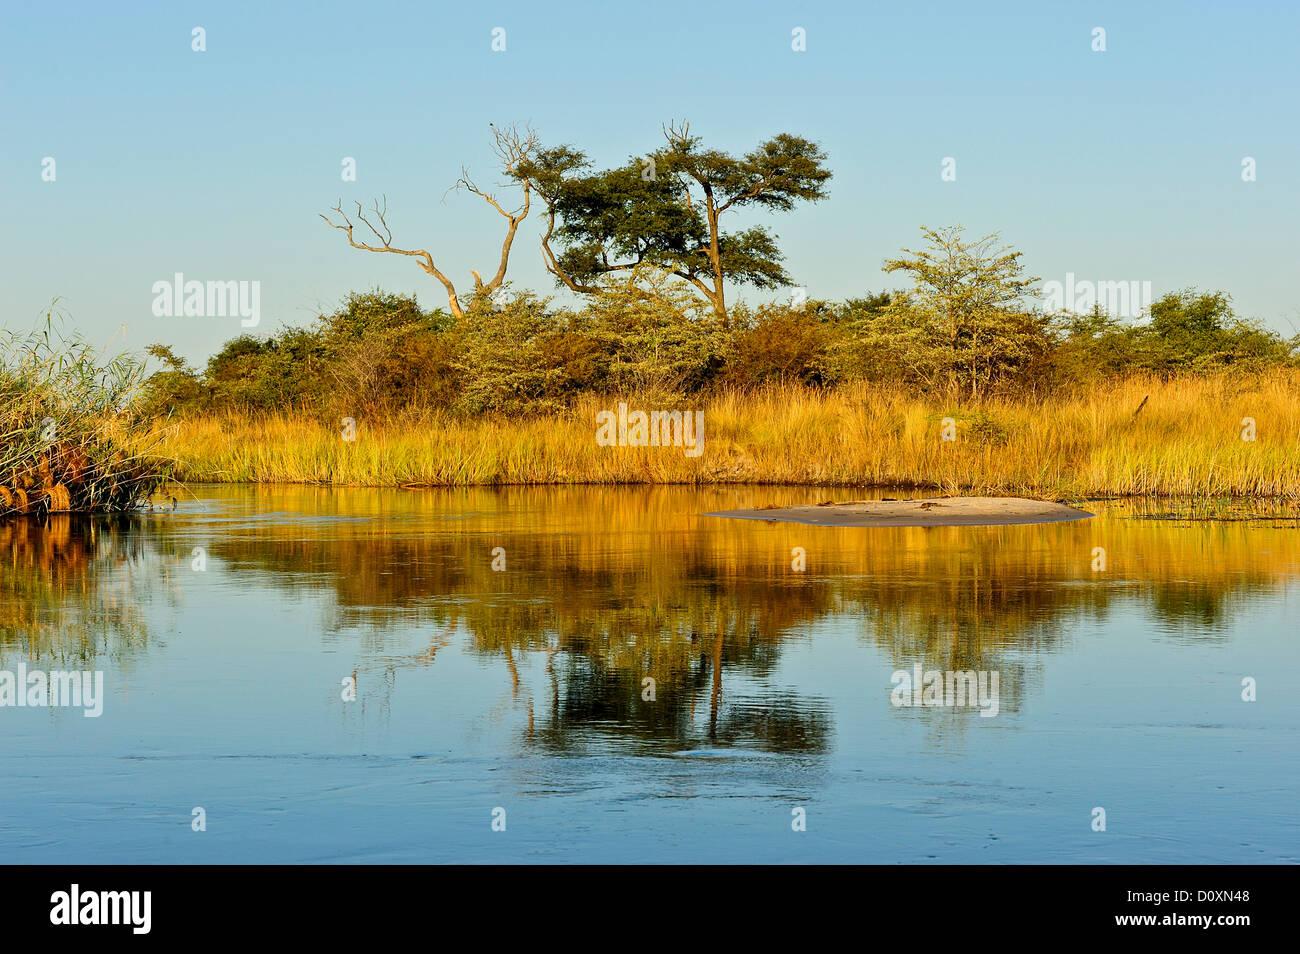 Africa, Bwa Bwata, National Park, Caprivi, Namibia, grasslands, horizontal, savannah, sunny, tree, water, watering Stock Photo